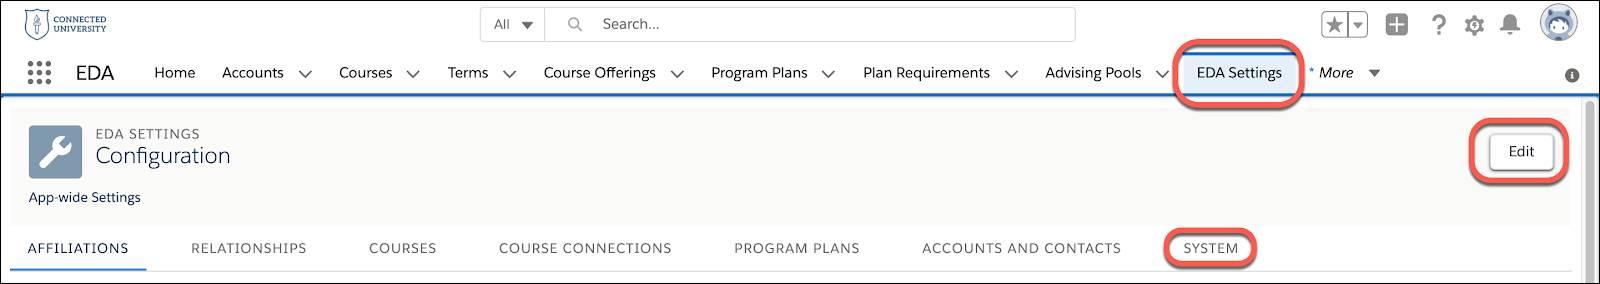 Navigate to System settings in EDA Settings.